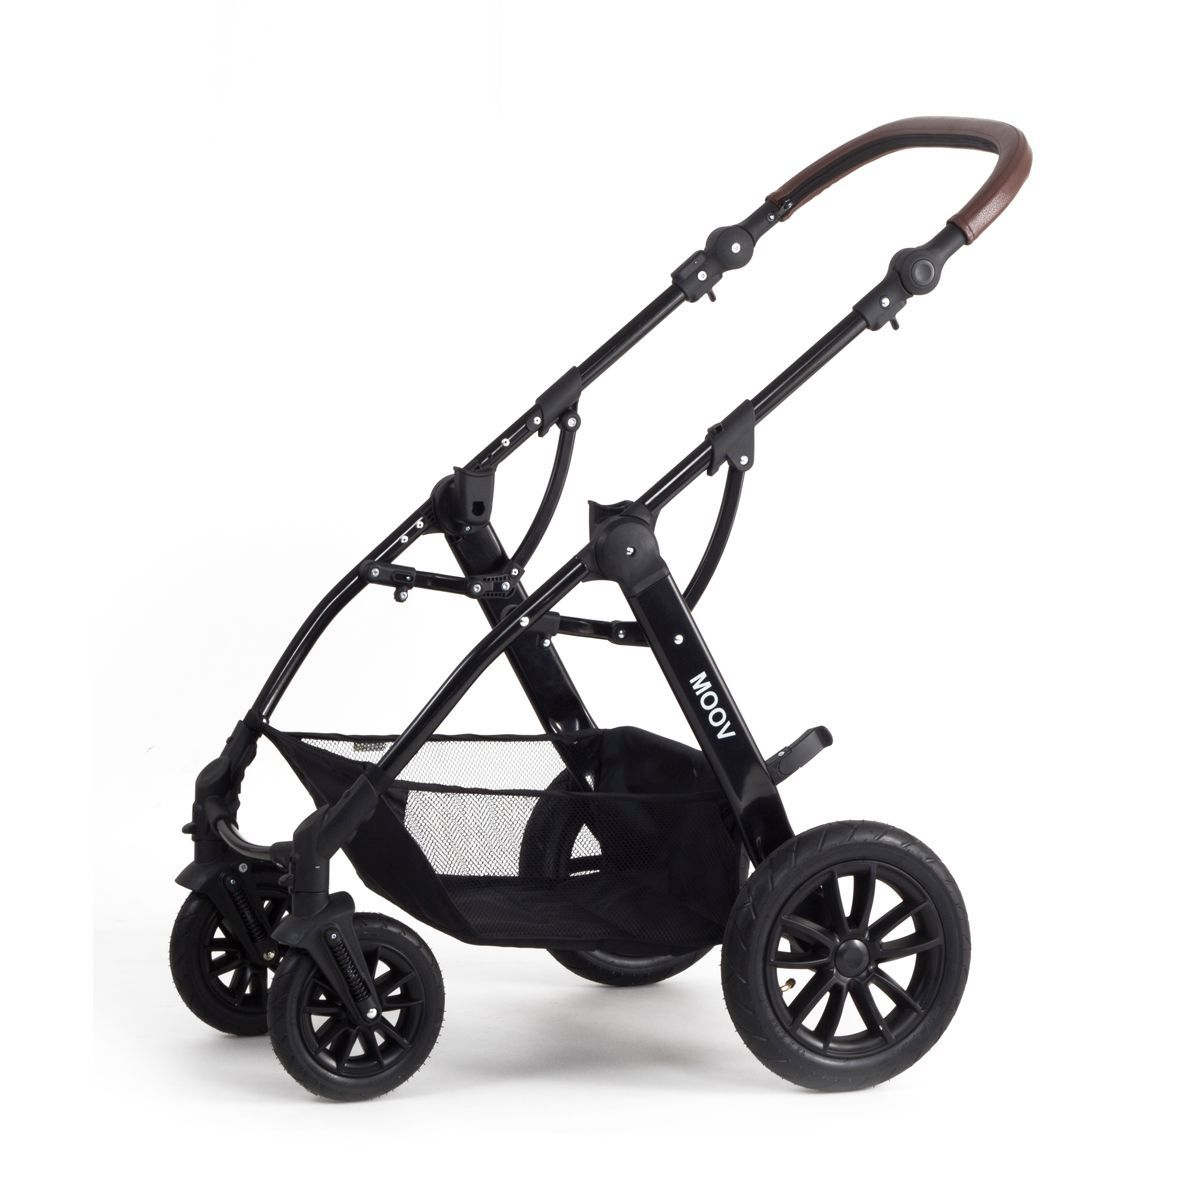 kinderkraft moov multi kinderwagen kombikinderwagen 3in1. Black Bedroom Furniture Sets. Home Design Ideas